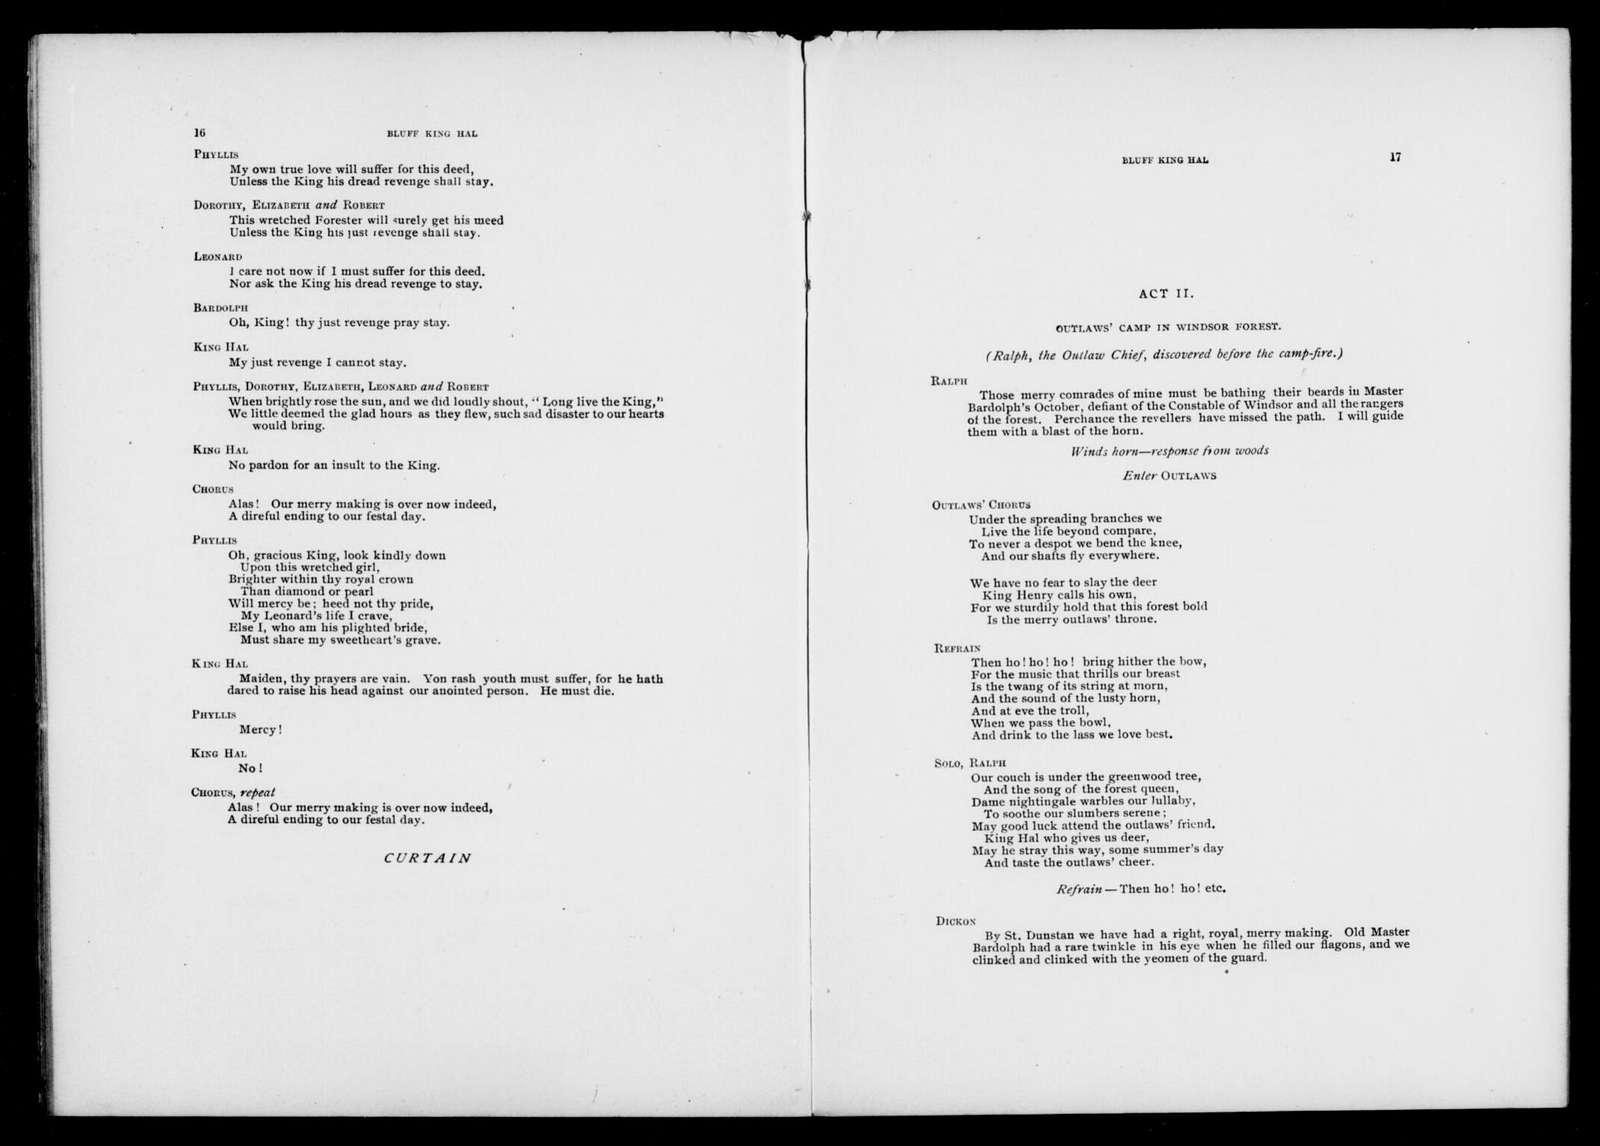 Bluff King Hal. Libretto. English